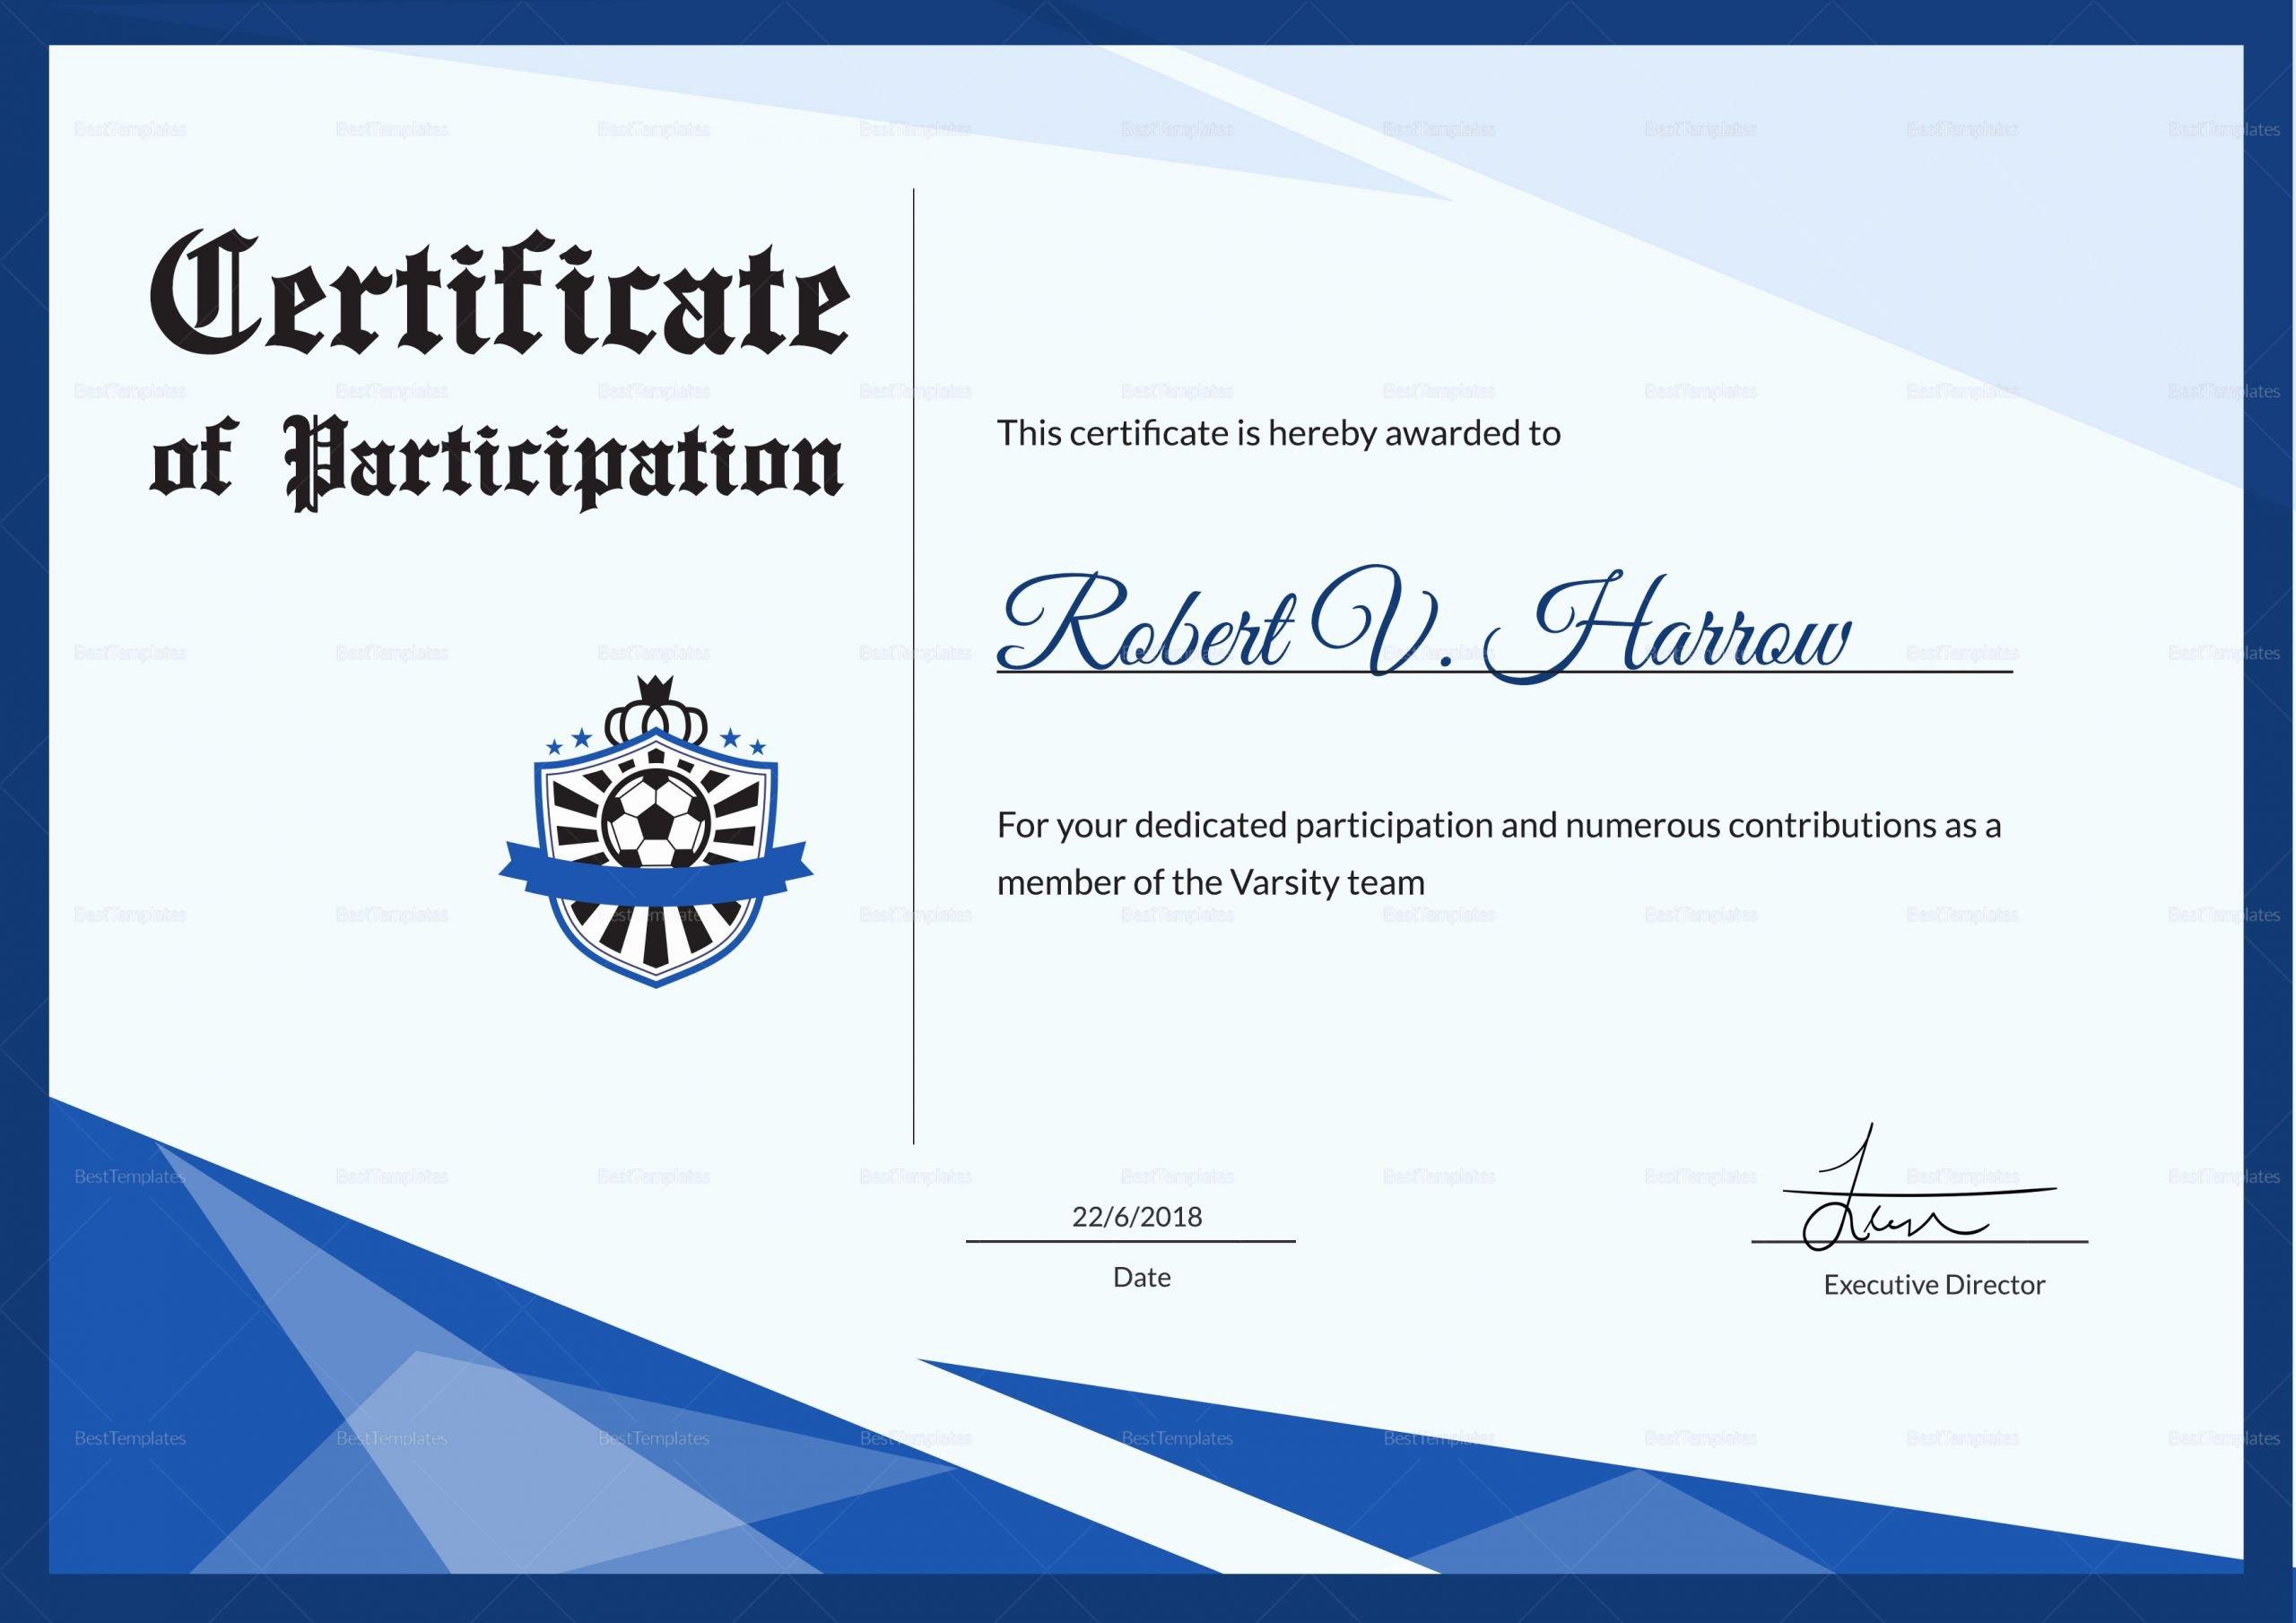 Football Award Certificate Template Lovely Football Award Certificate Design Template In Psd Word